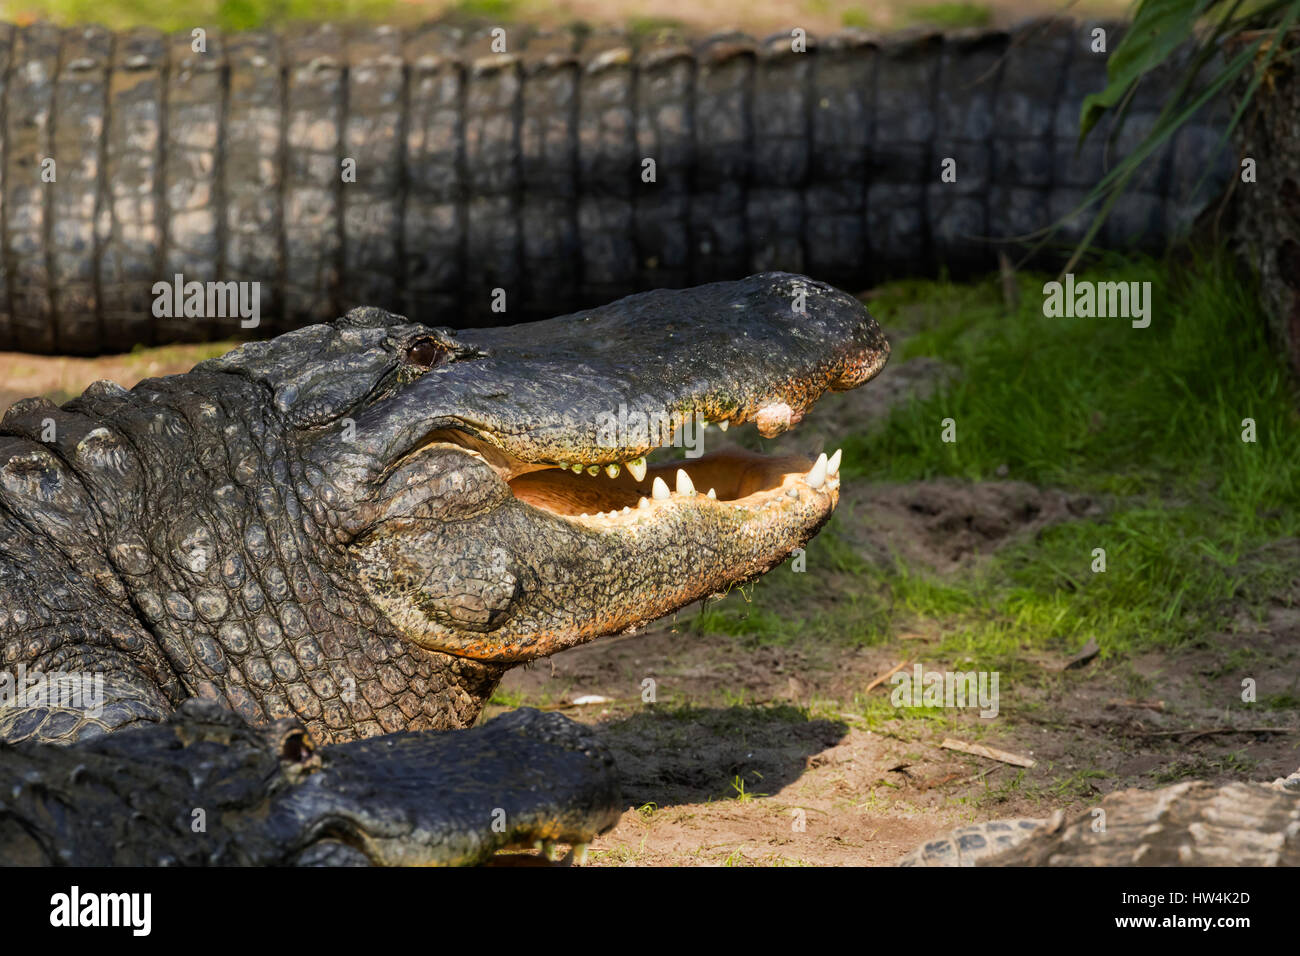 American Alligator (Alligator mississippiensis) bellowing, St Augustine, FL, USA - Stock Image